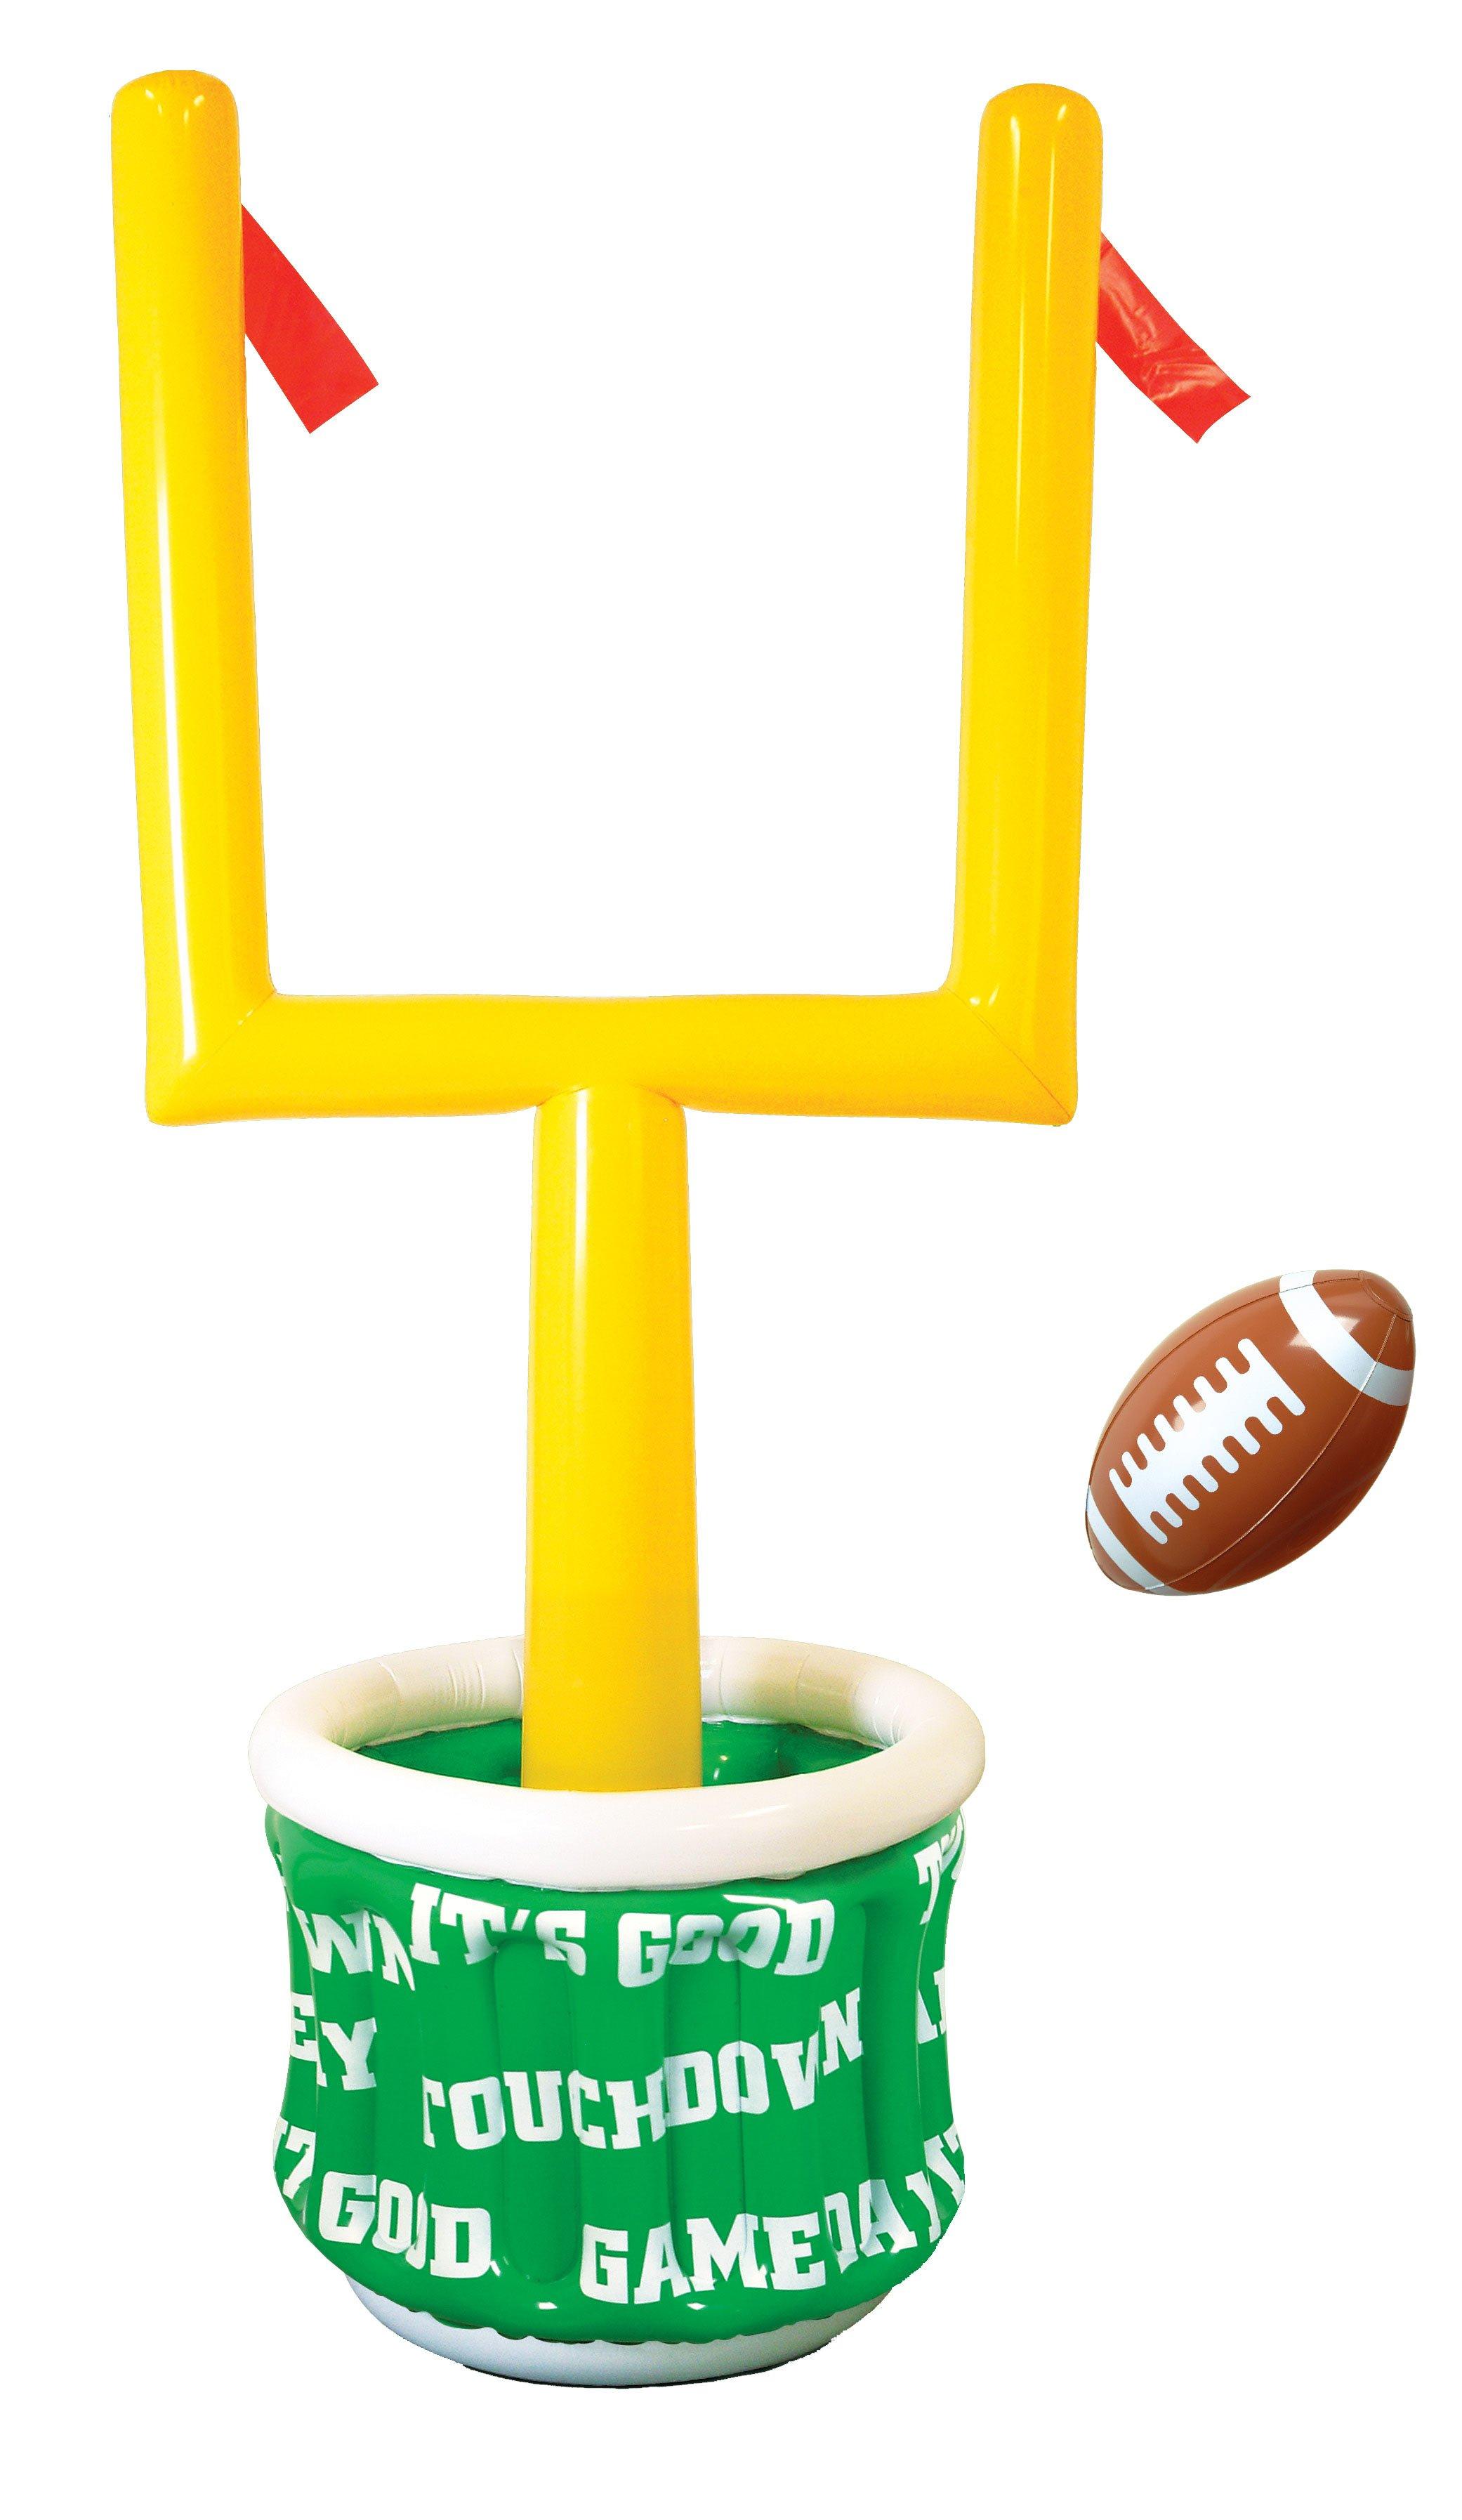 Clipart Football Goal Post Free-Clipart Football Goal Post Free-5